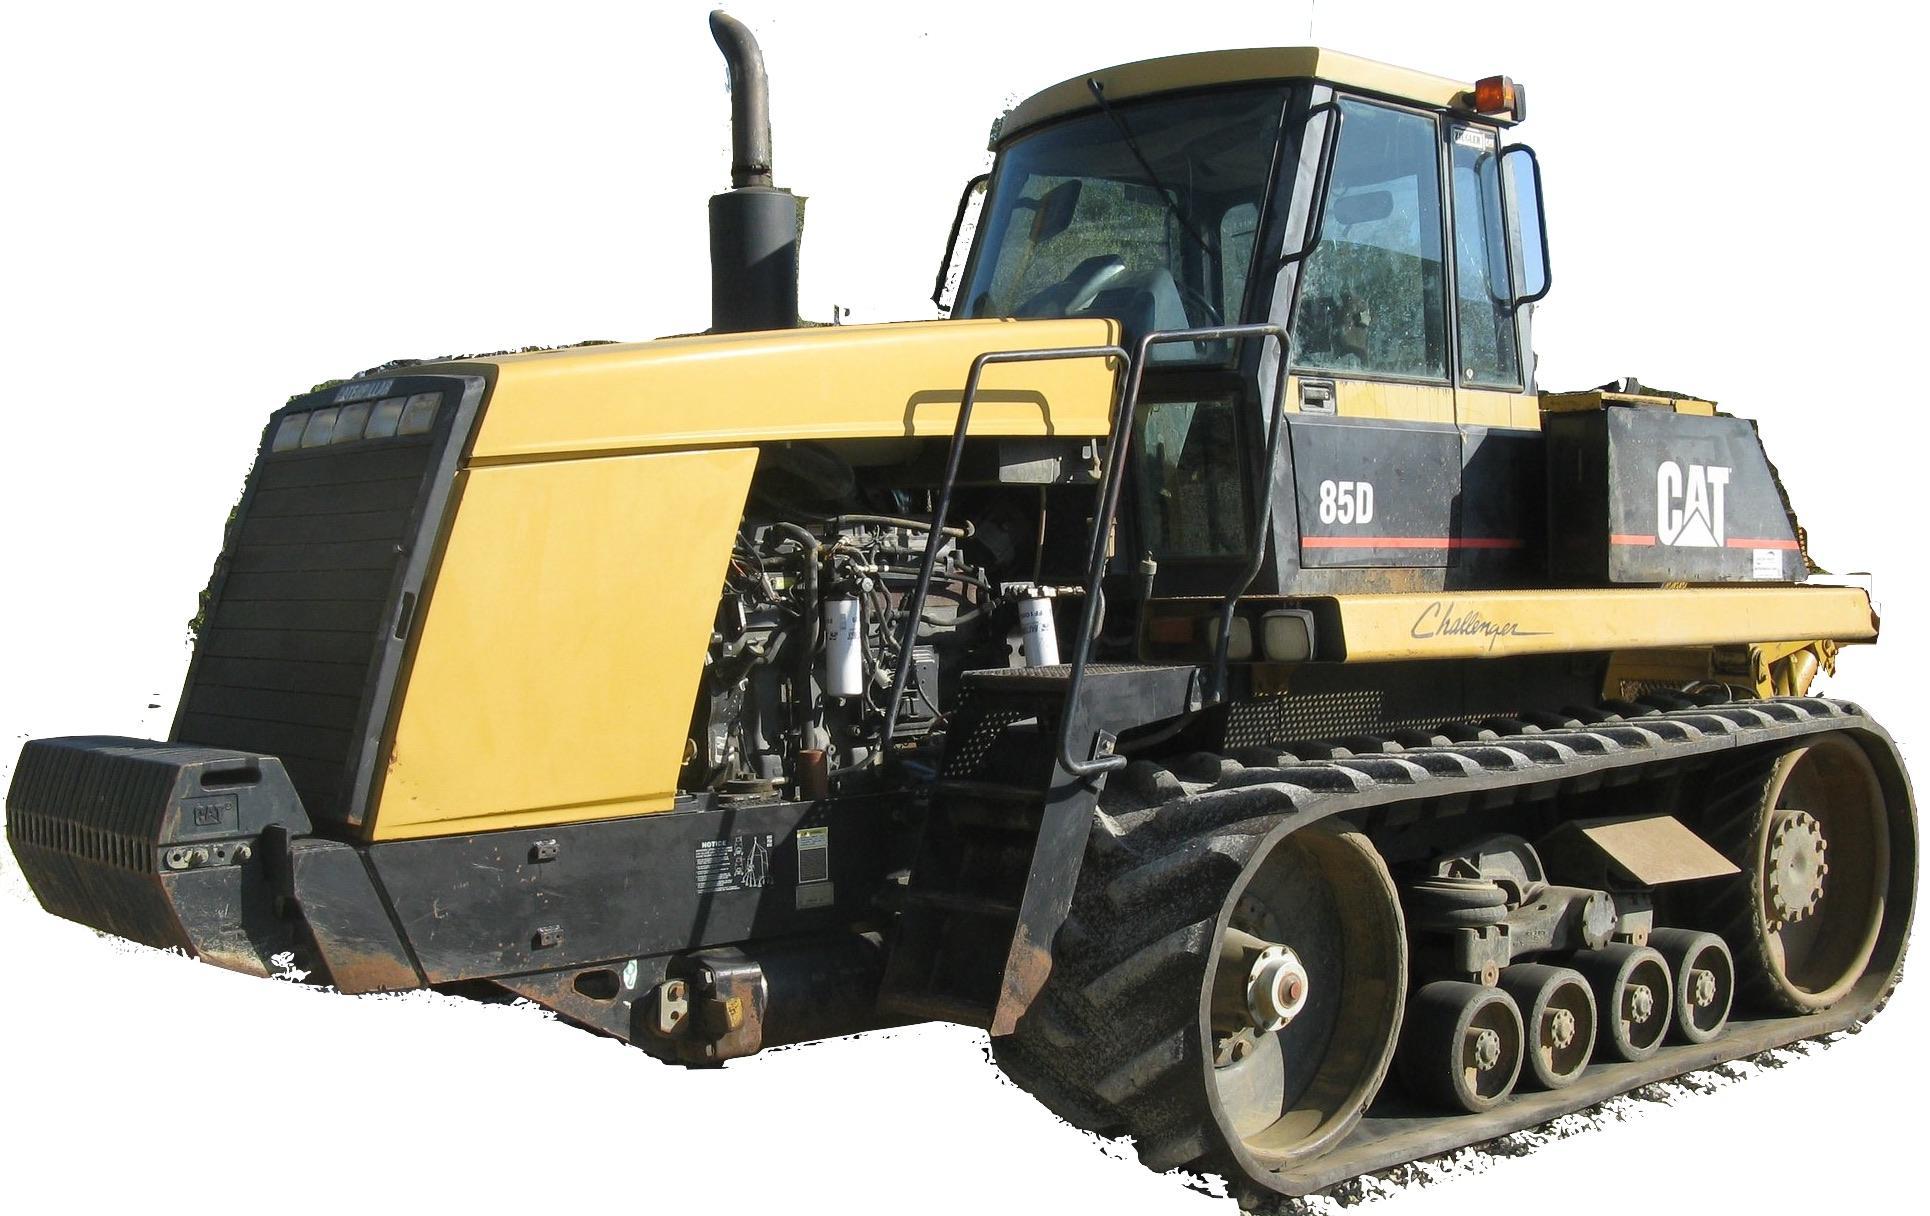 Challenger Agricultural Tractors 65b  65c  65d  65e  70c